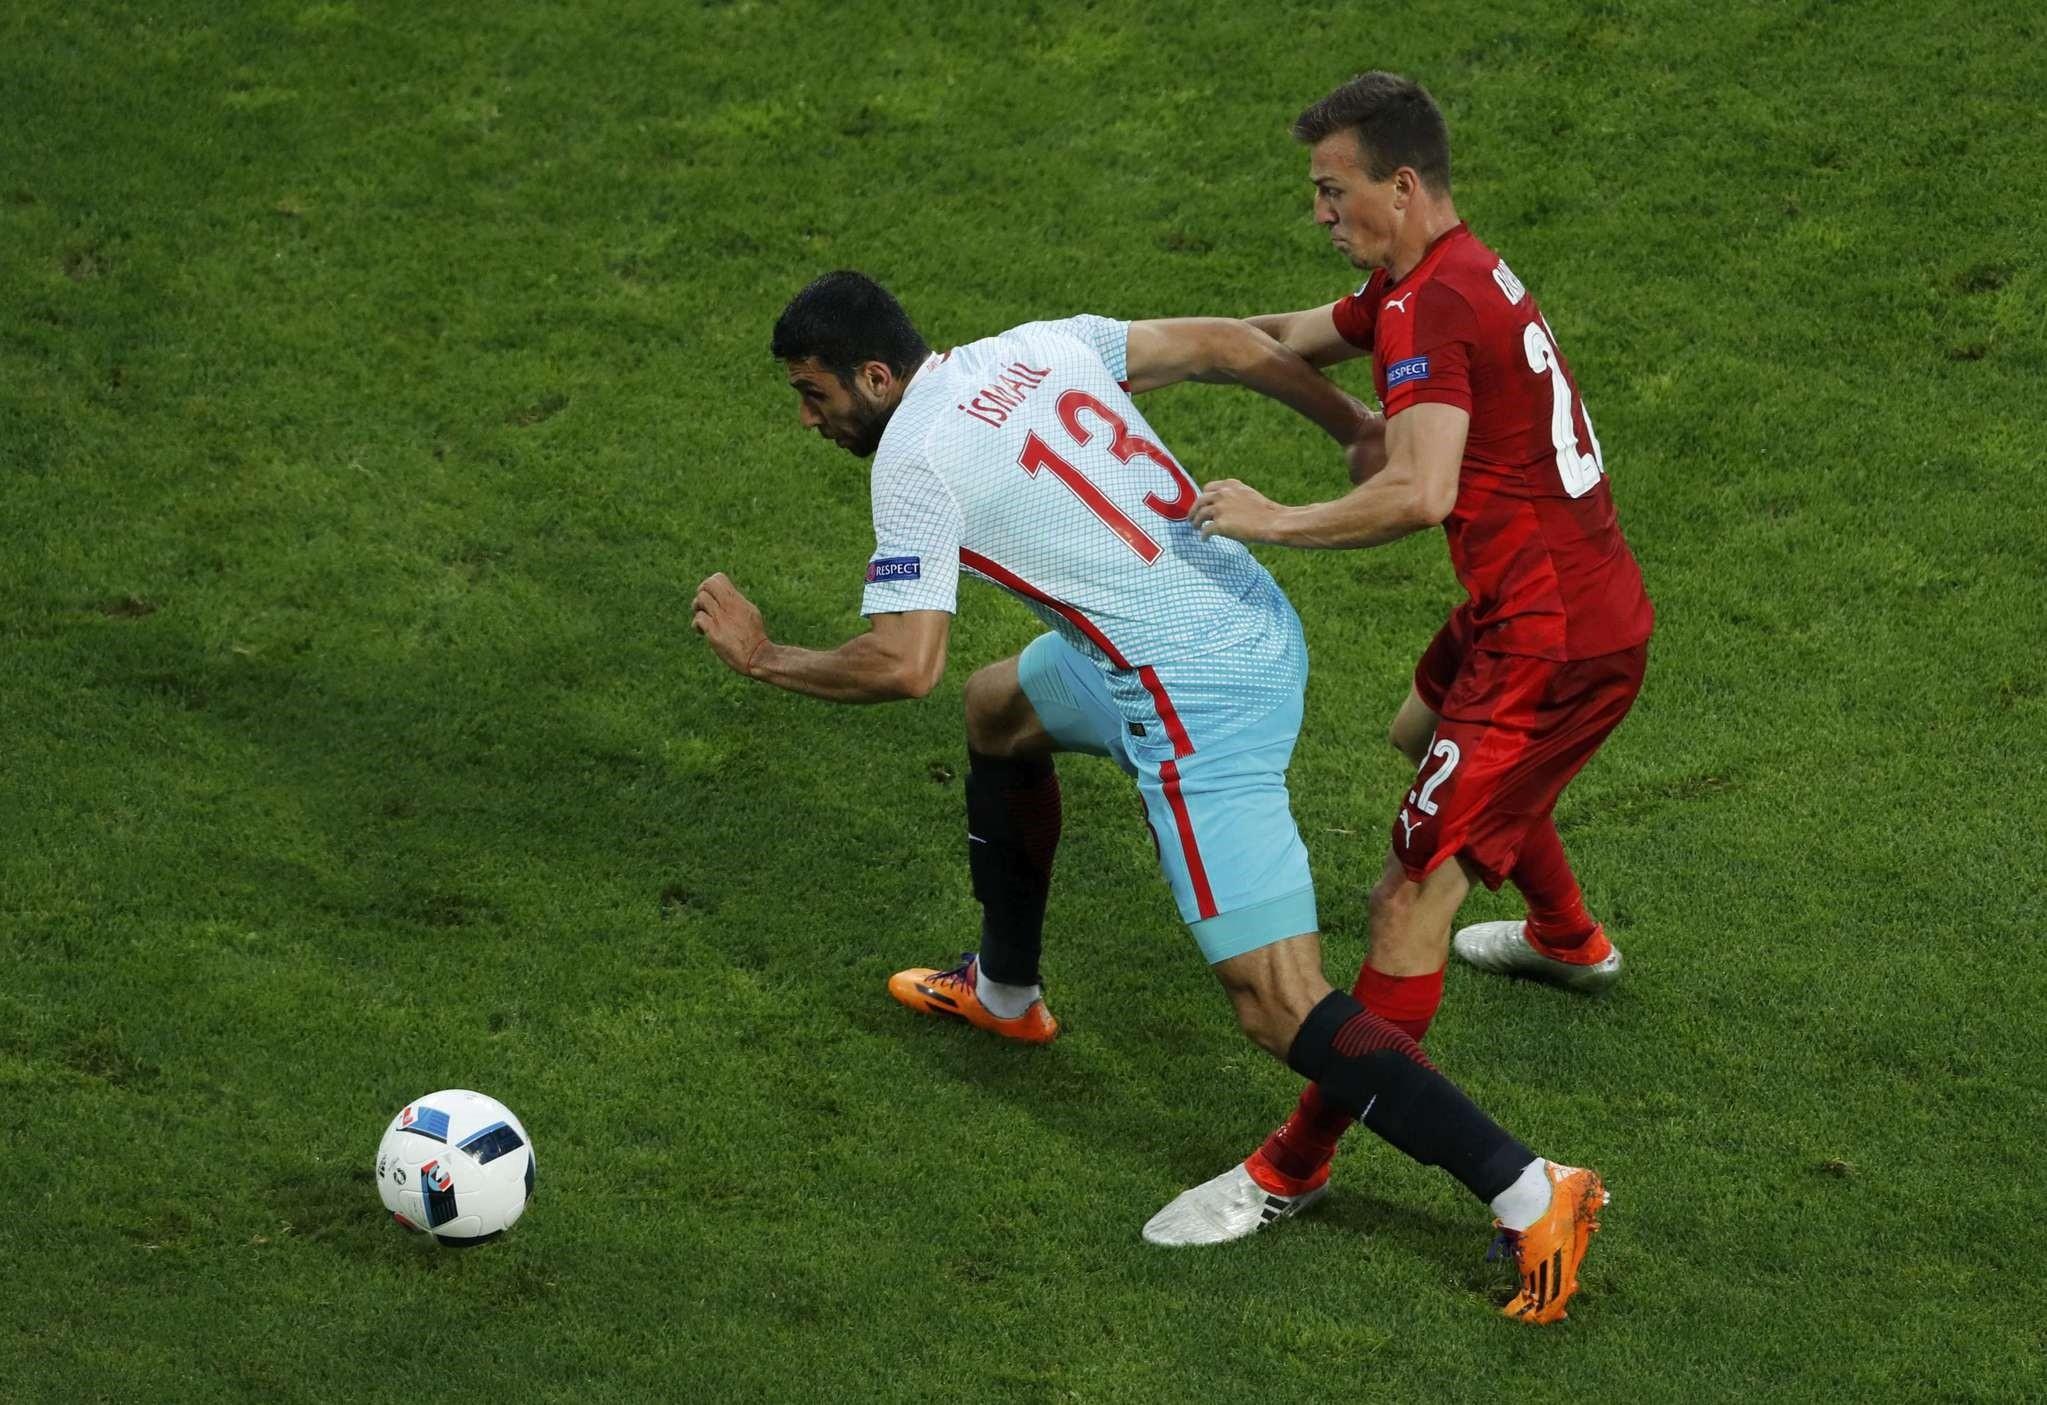 Czech Republic's Vladimir Darida and Turkey's Ismail Ku00f6ybau015fu0131 in action (Reuters Photo)